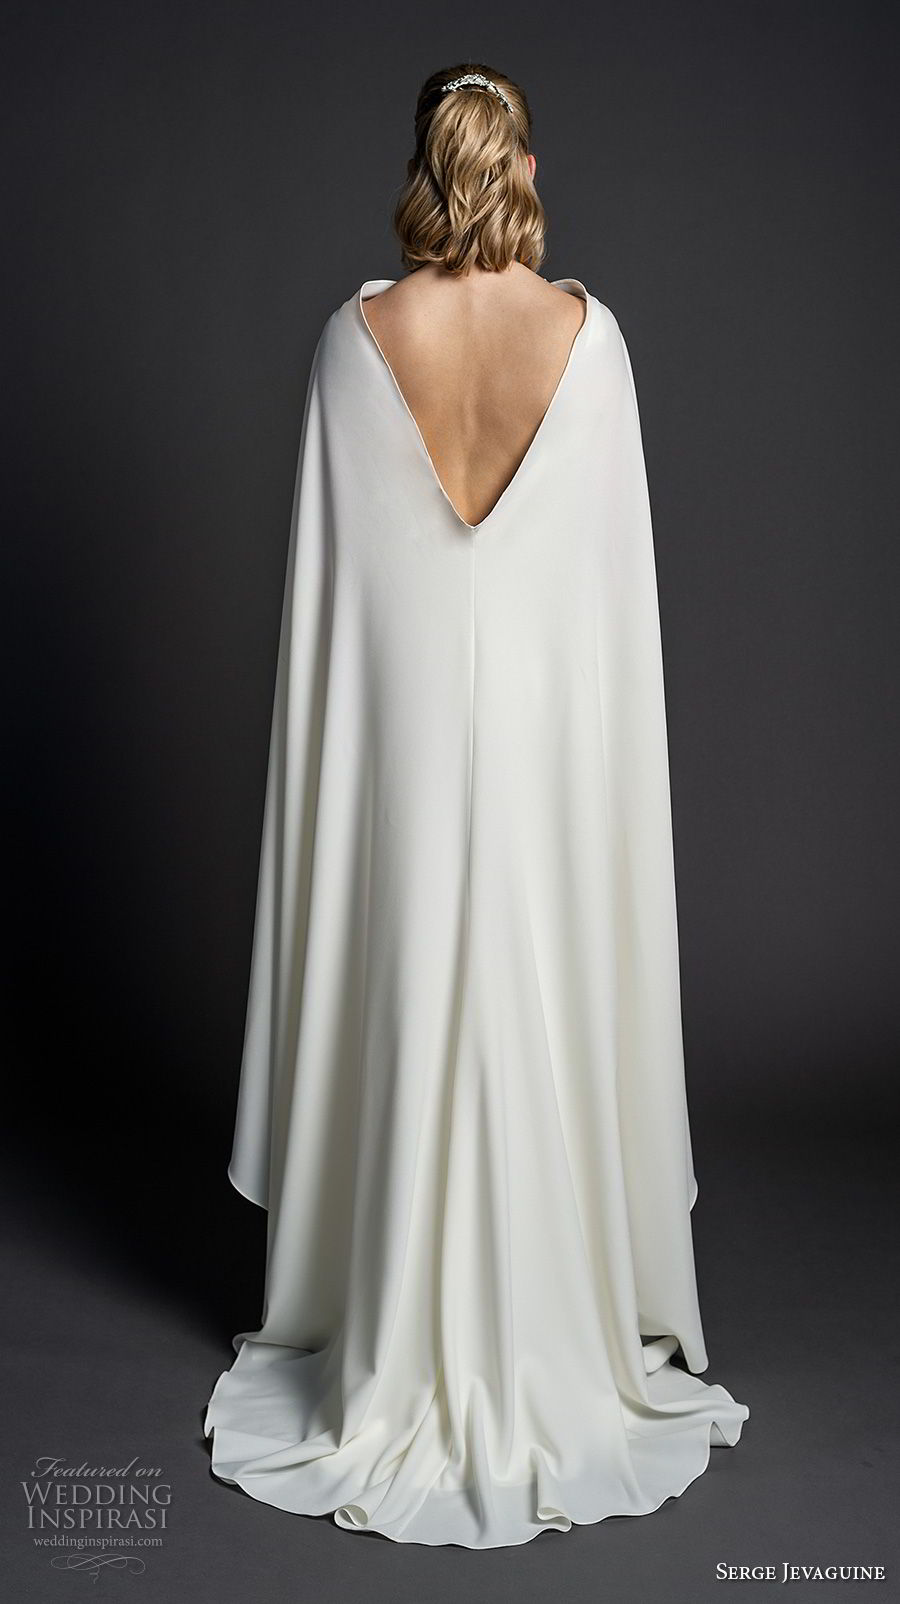 serge jevaguine 2019 bridal sleeveless deep v neck simple clean bodice minimalist elegant sheath wedding dress with cape open v back short train (7) bv